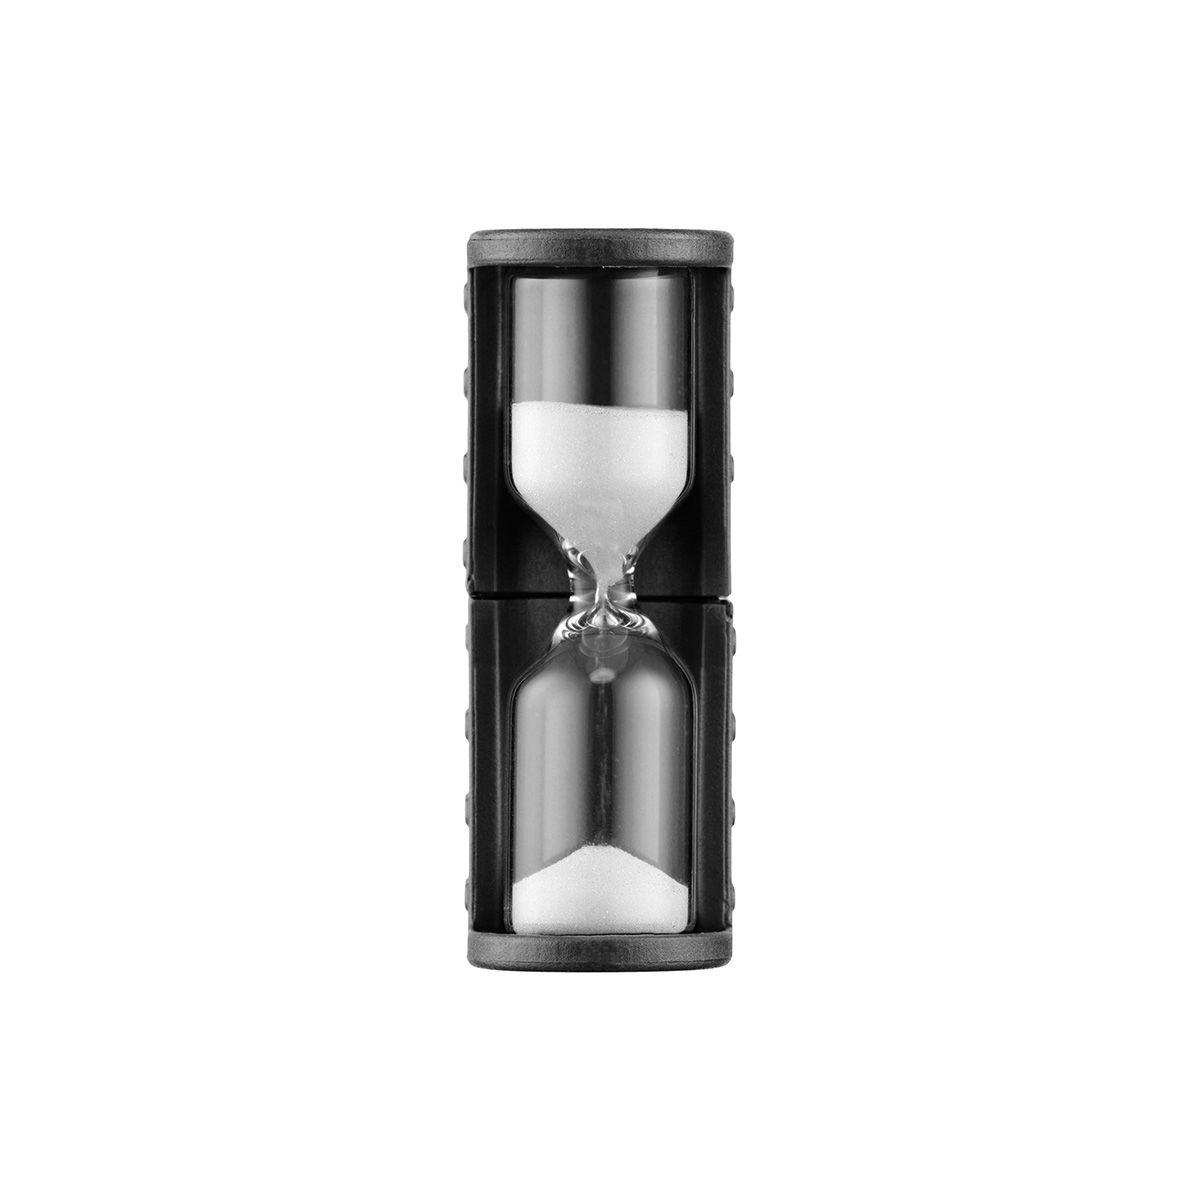 4-minute timer - Bodum